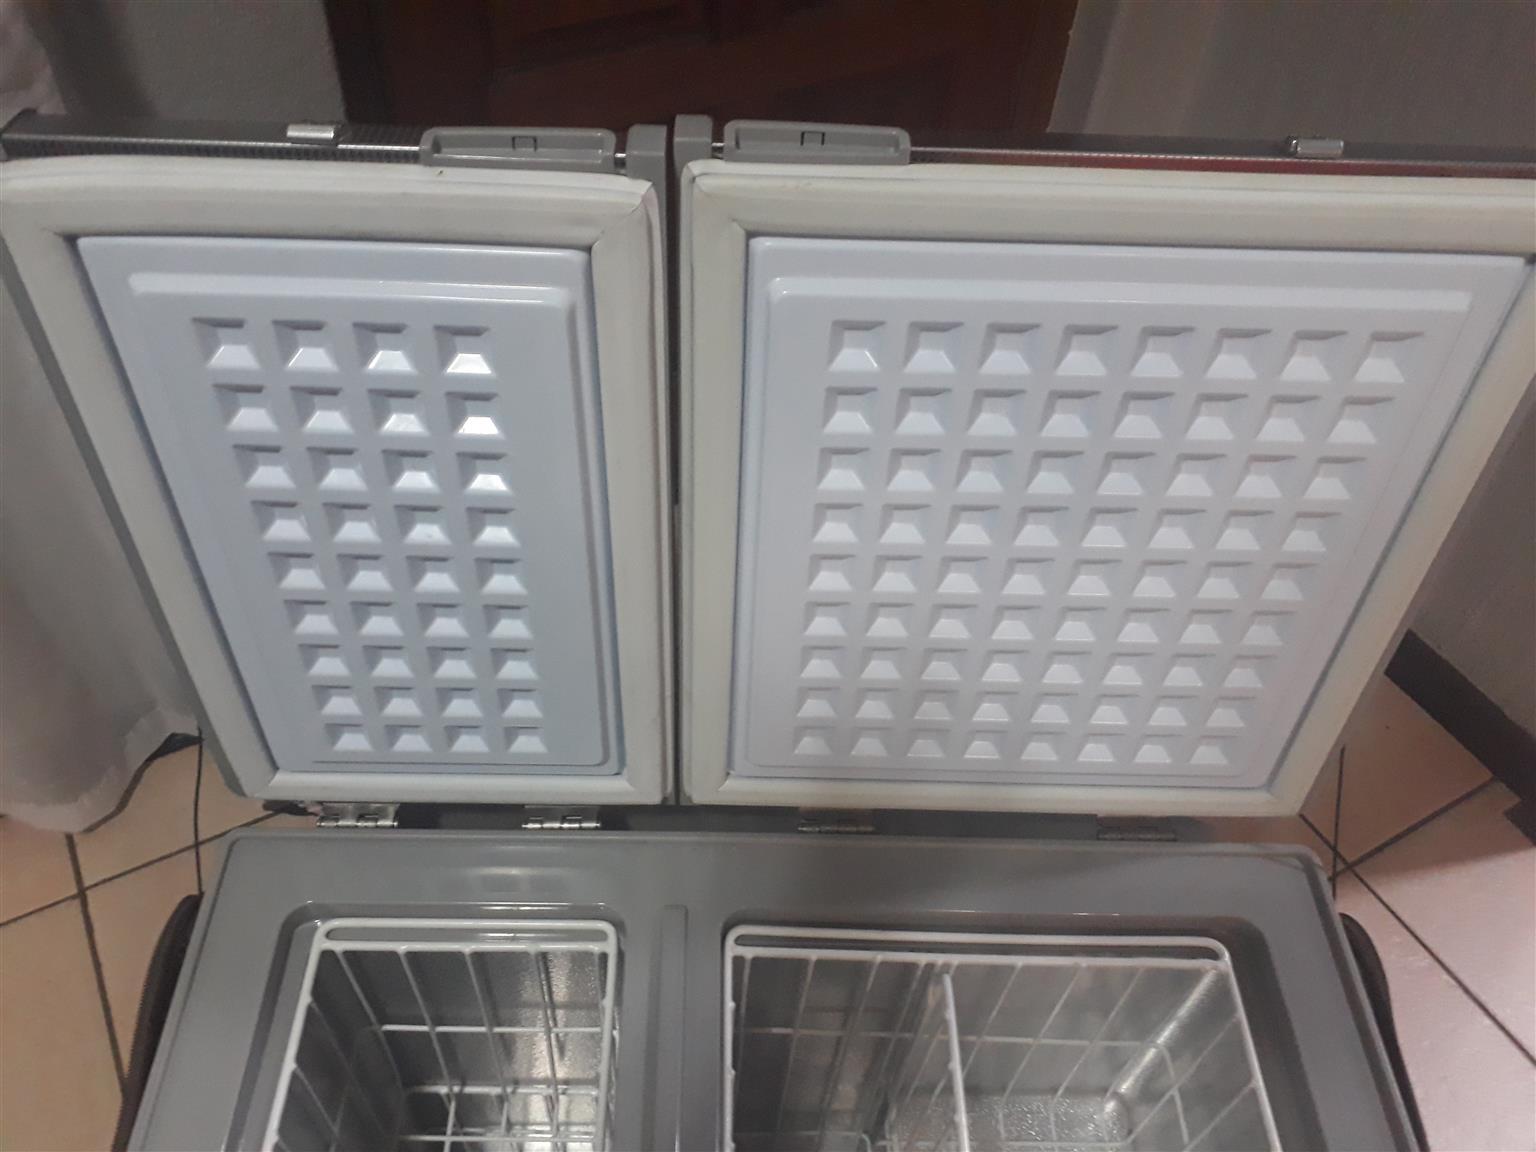 Campmaster 72L fridge Freezer